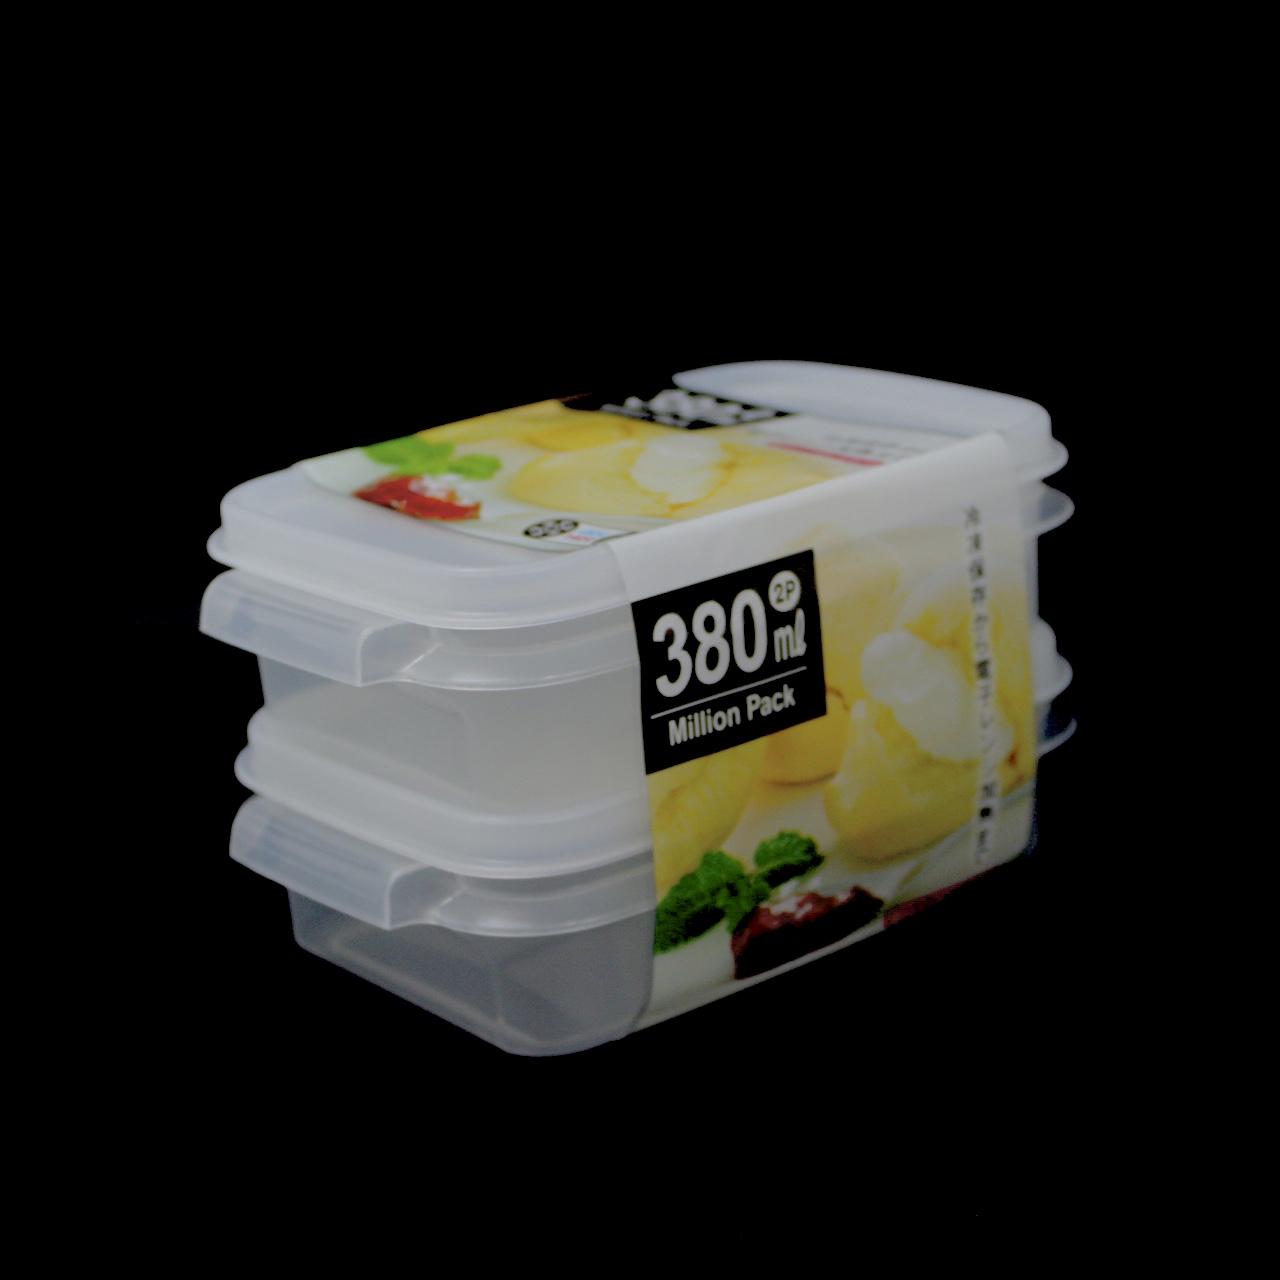 YAMADA MILLION POTE 380 ml 2UN No.523 CLEAR